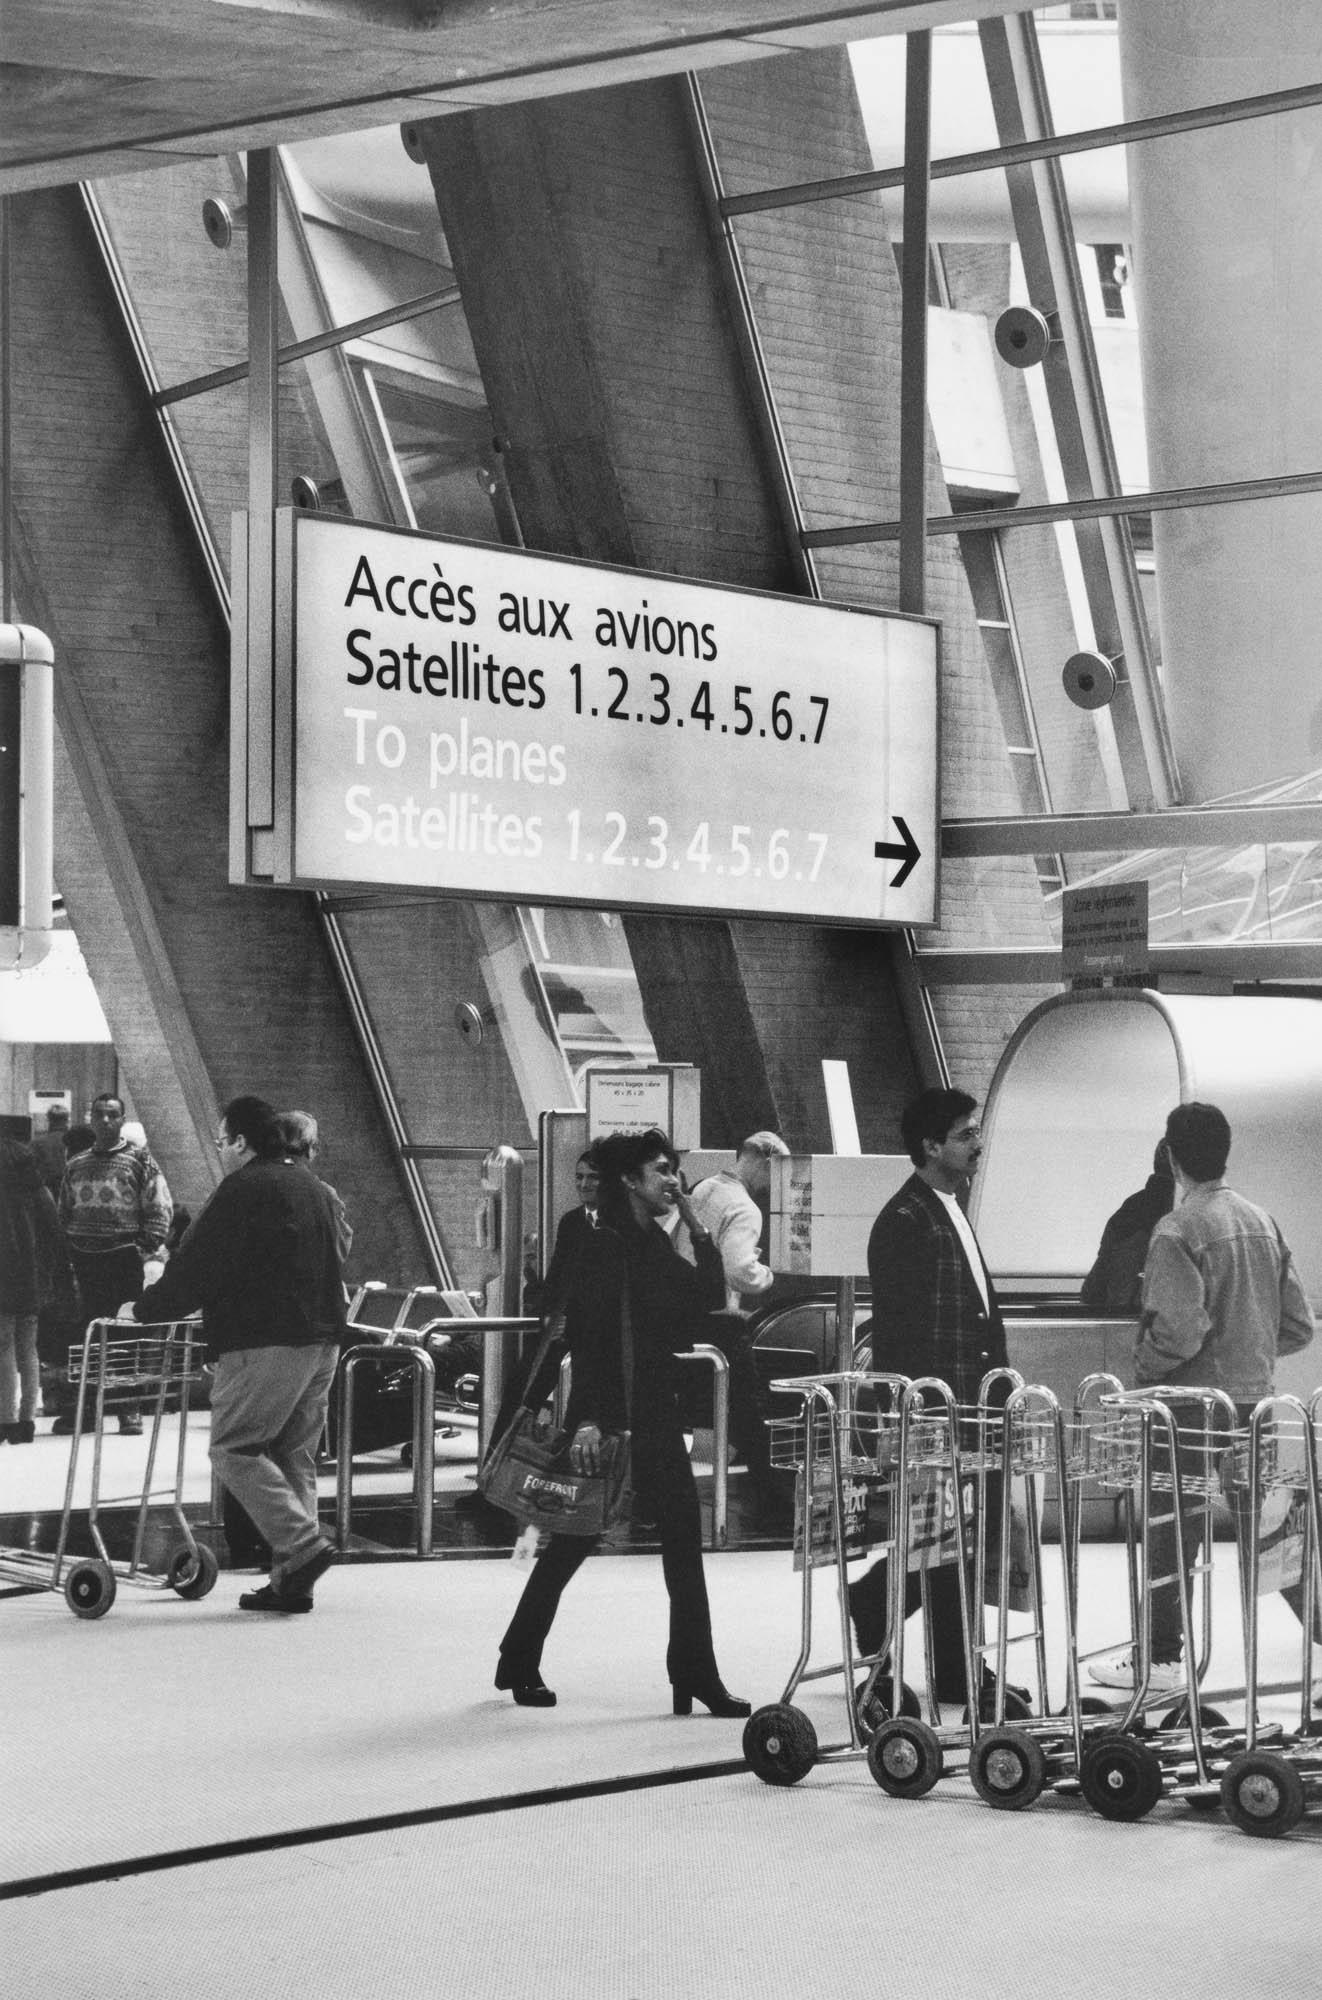 Frutiger Font in Charles de Gaulle Airport 2